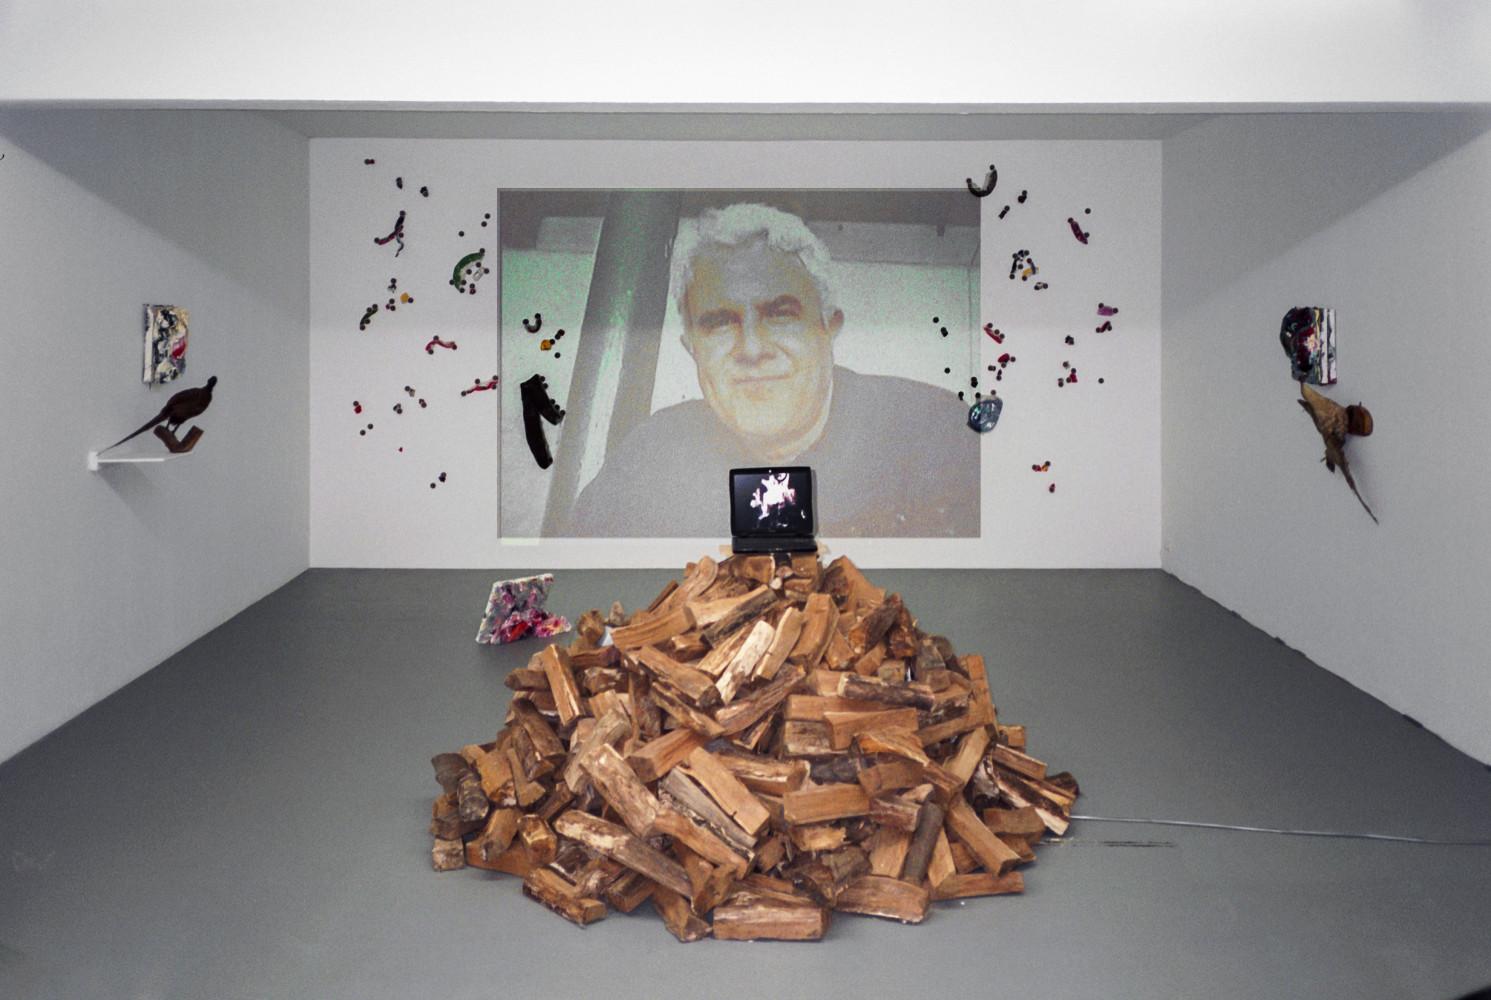 'Mark Millof', Installation view, 2001